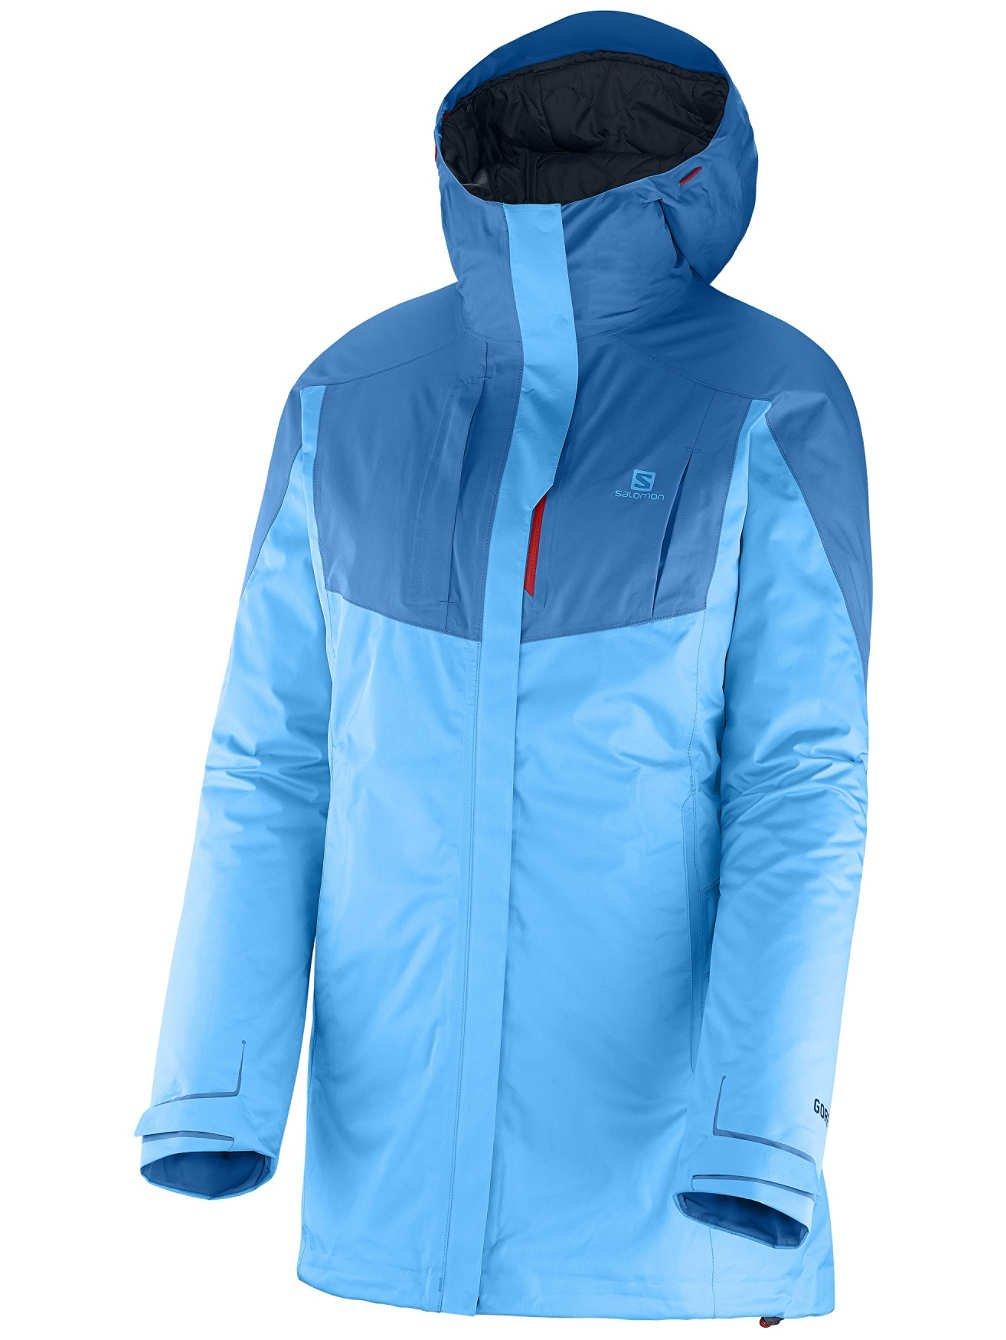 Damen Snowboard Jacke Salomon Cyclone Jacket kaufen